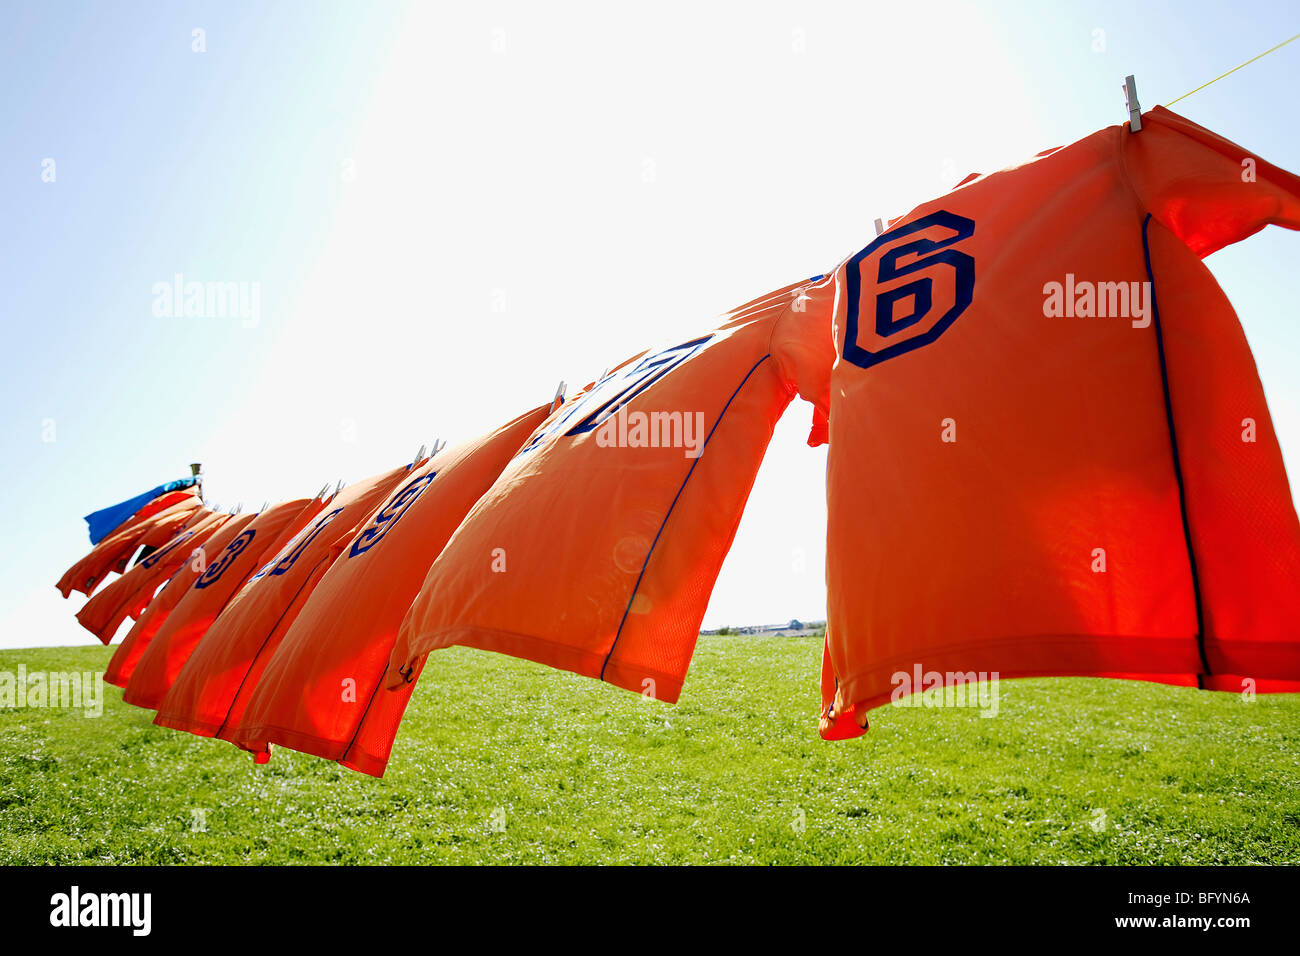 football shirt hanging stockfotos football shirt hanging bilder alamy. Black Bedroom Furniture Sets. Home Design Ideas